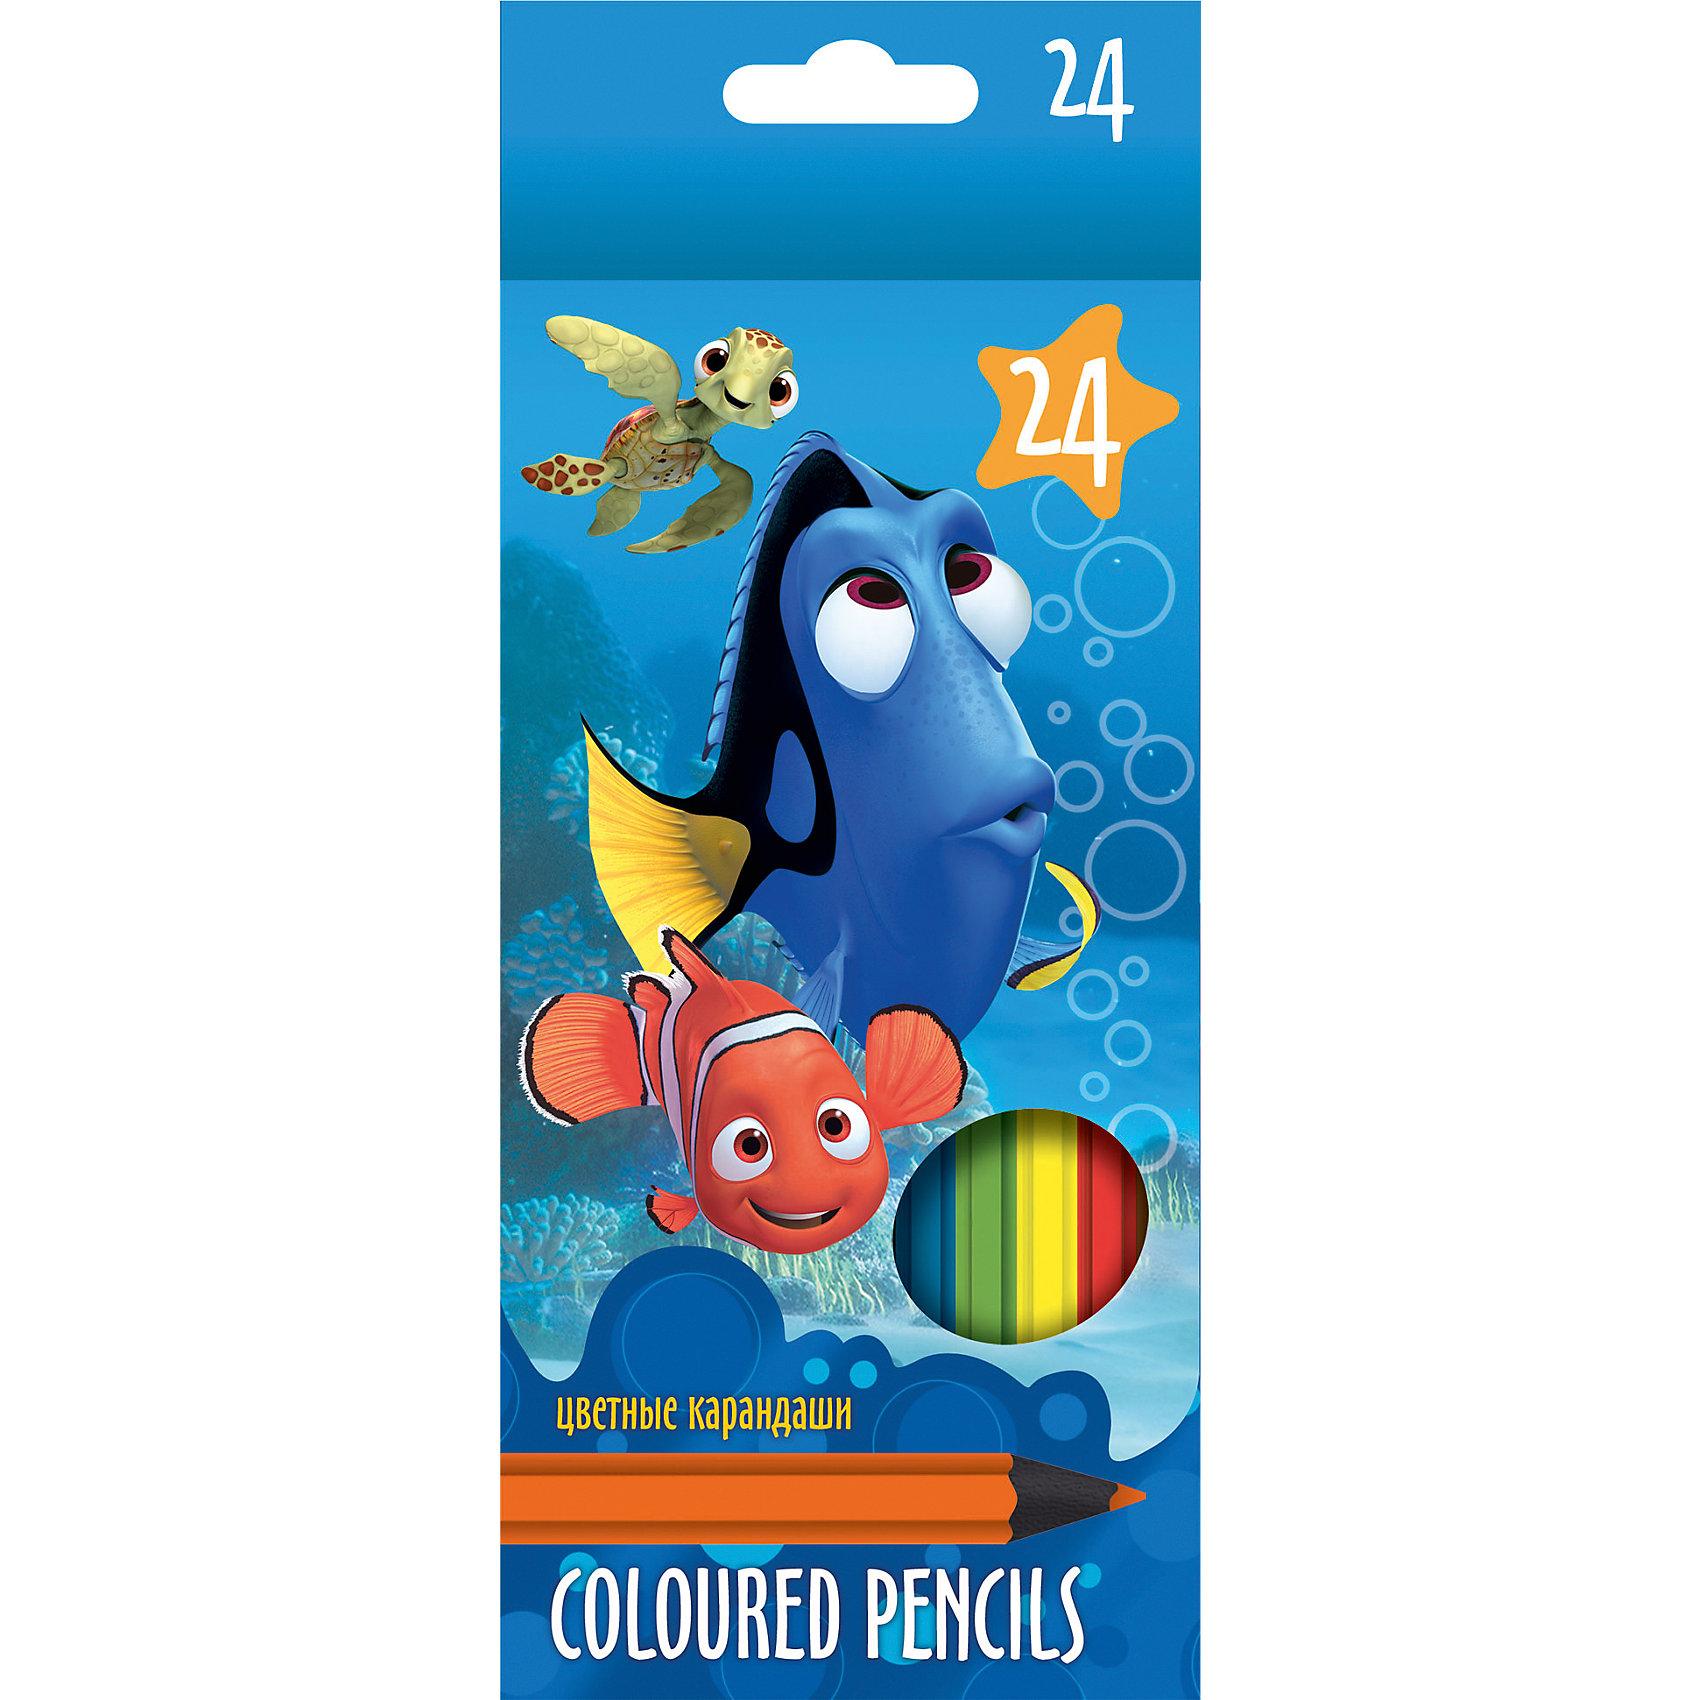 Limpopo Цветные карандаши Немо 24 цвета фломастеры limpopo фломастеры limpopo max speed 24 цвета